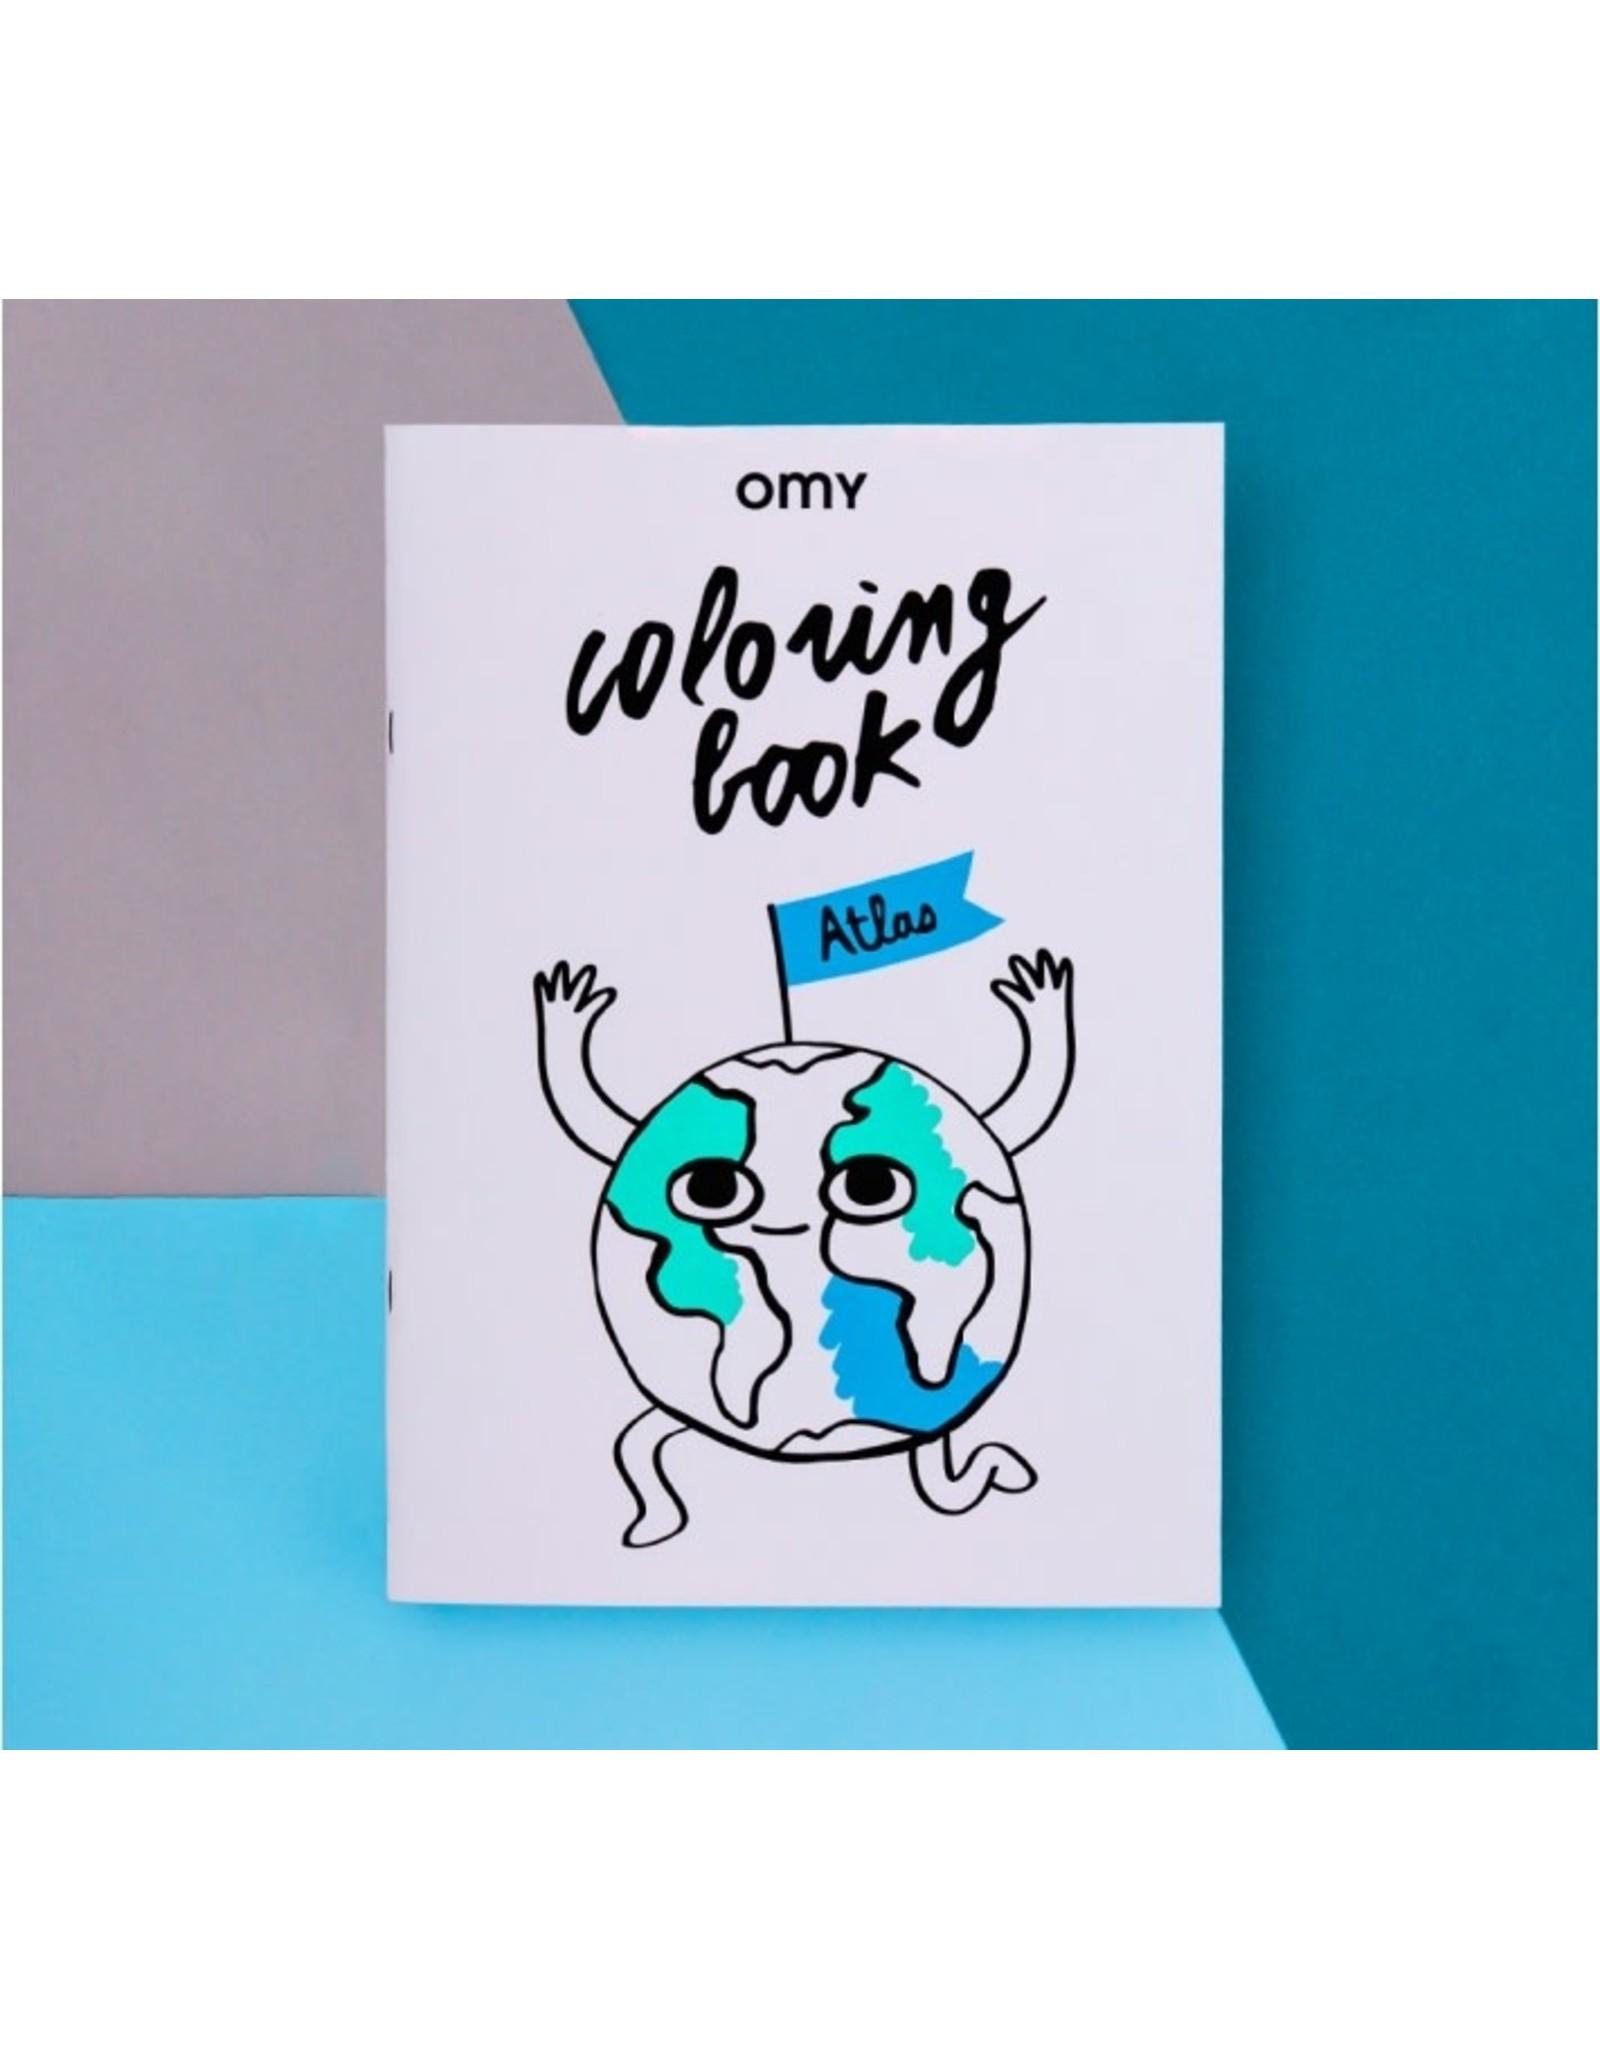 OMY Coloring book atlas